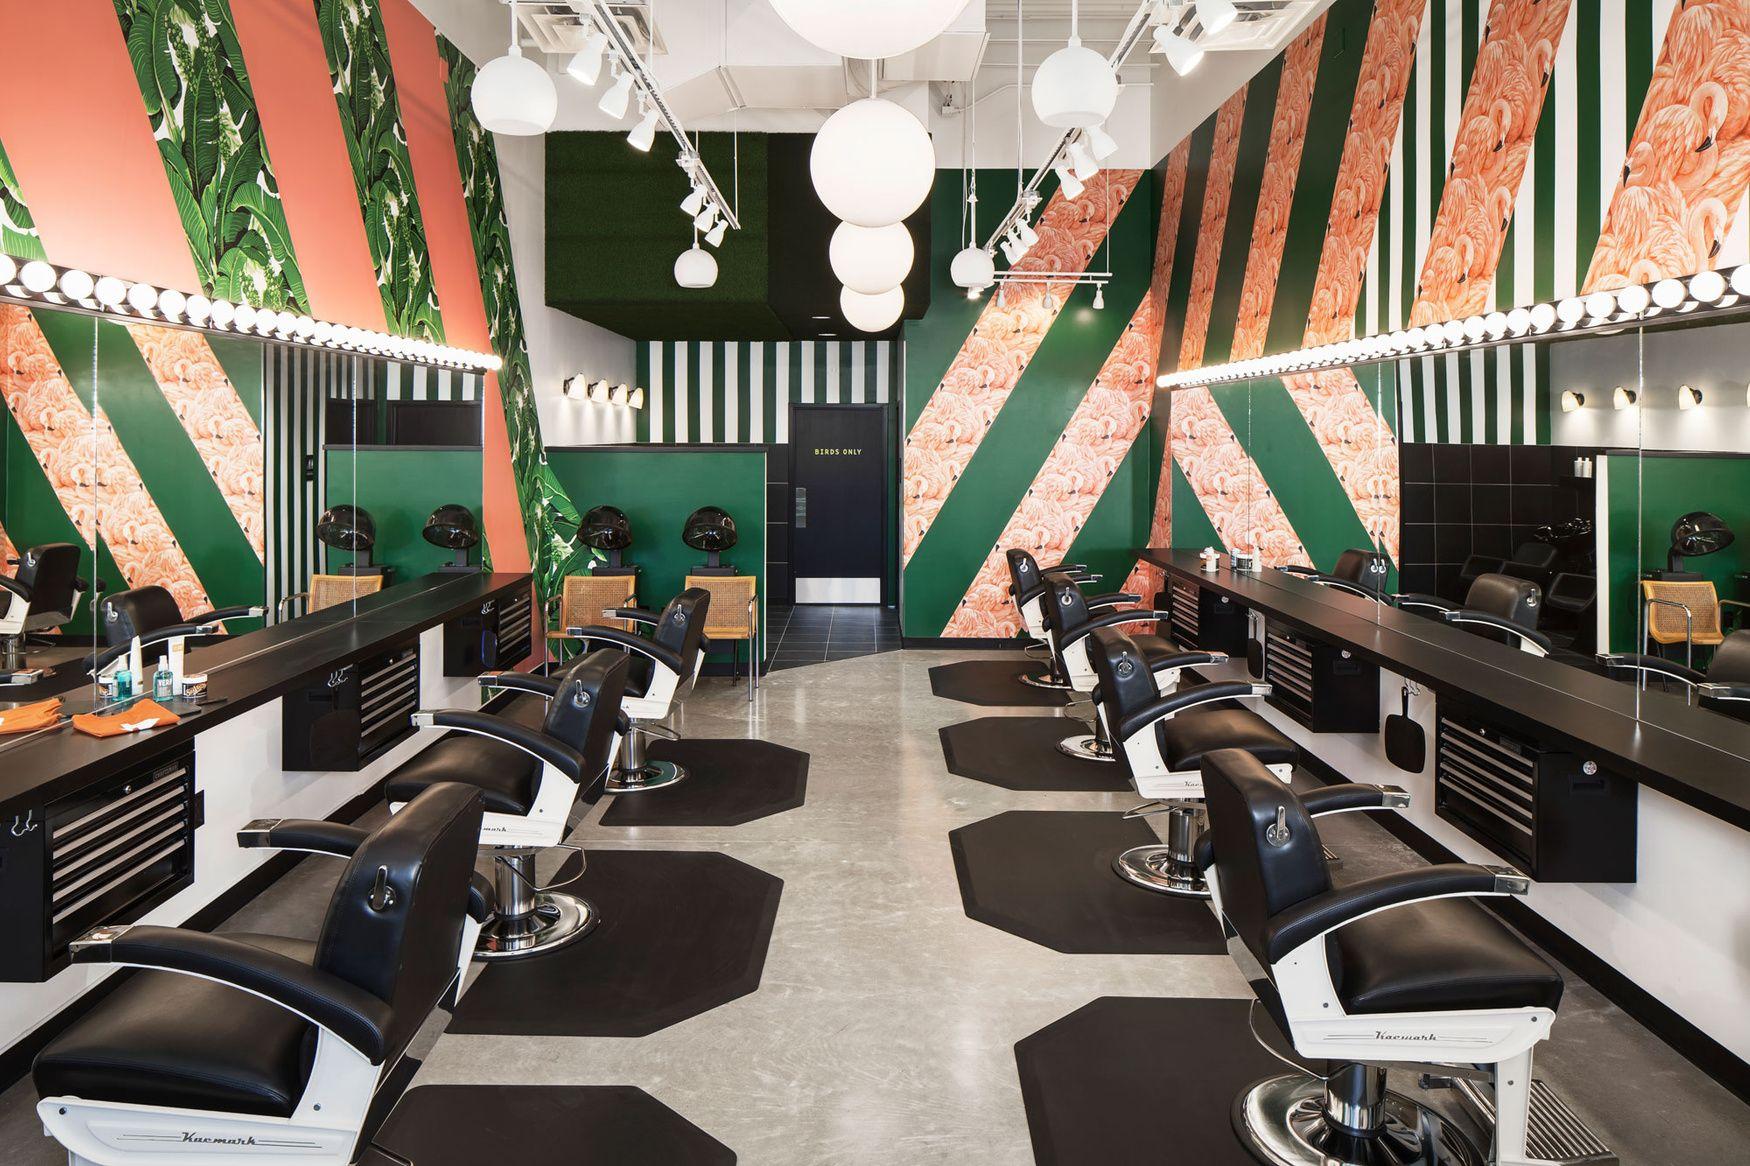 Barbershop The Domain Markodomstudio Barber Shop Design Prefab Homes